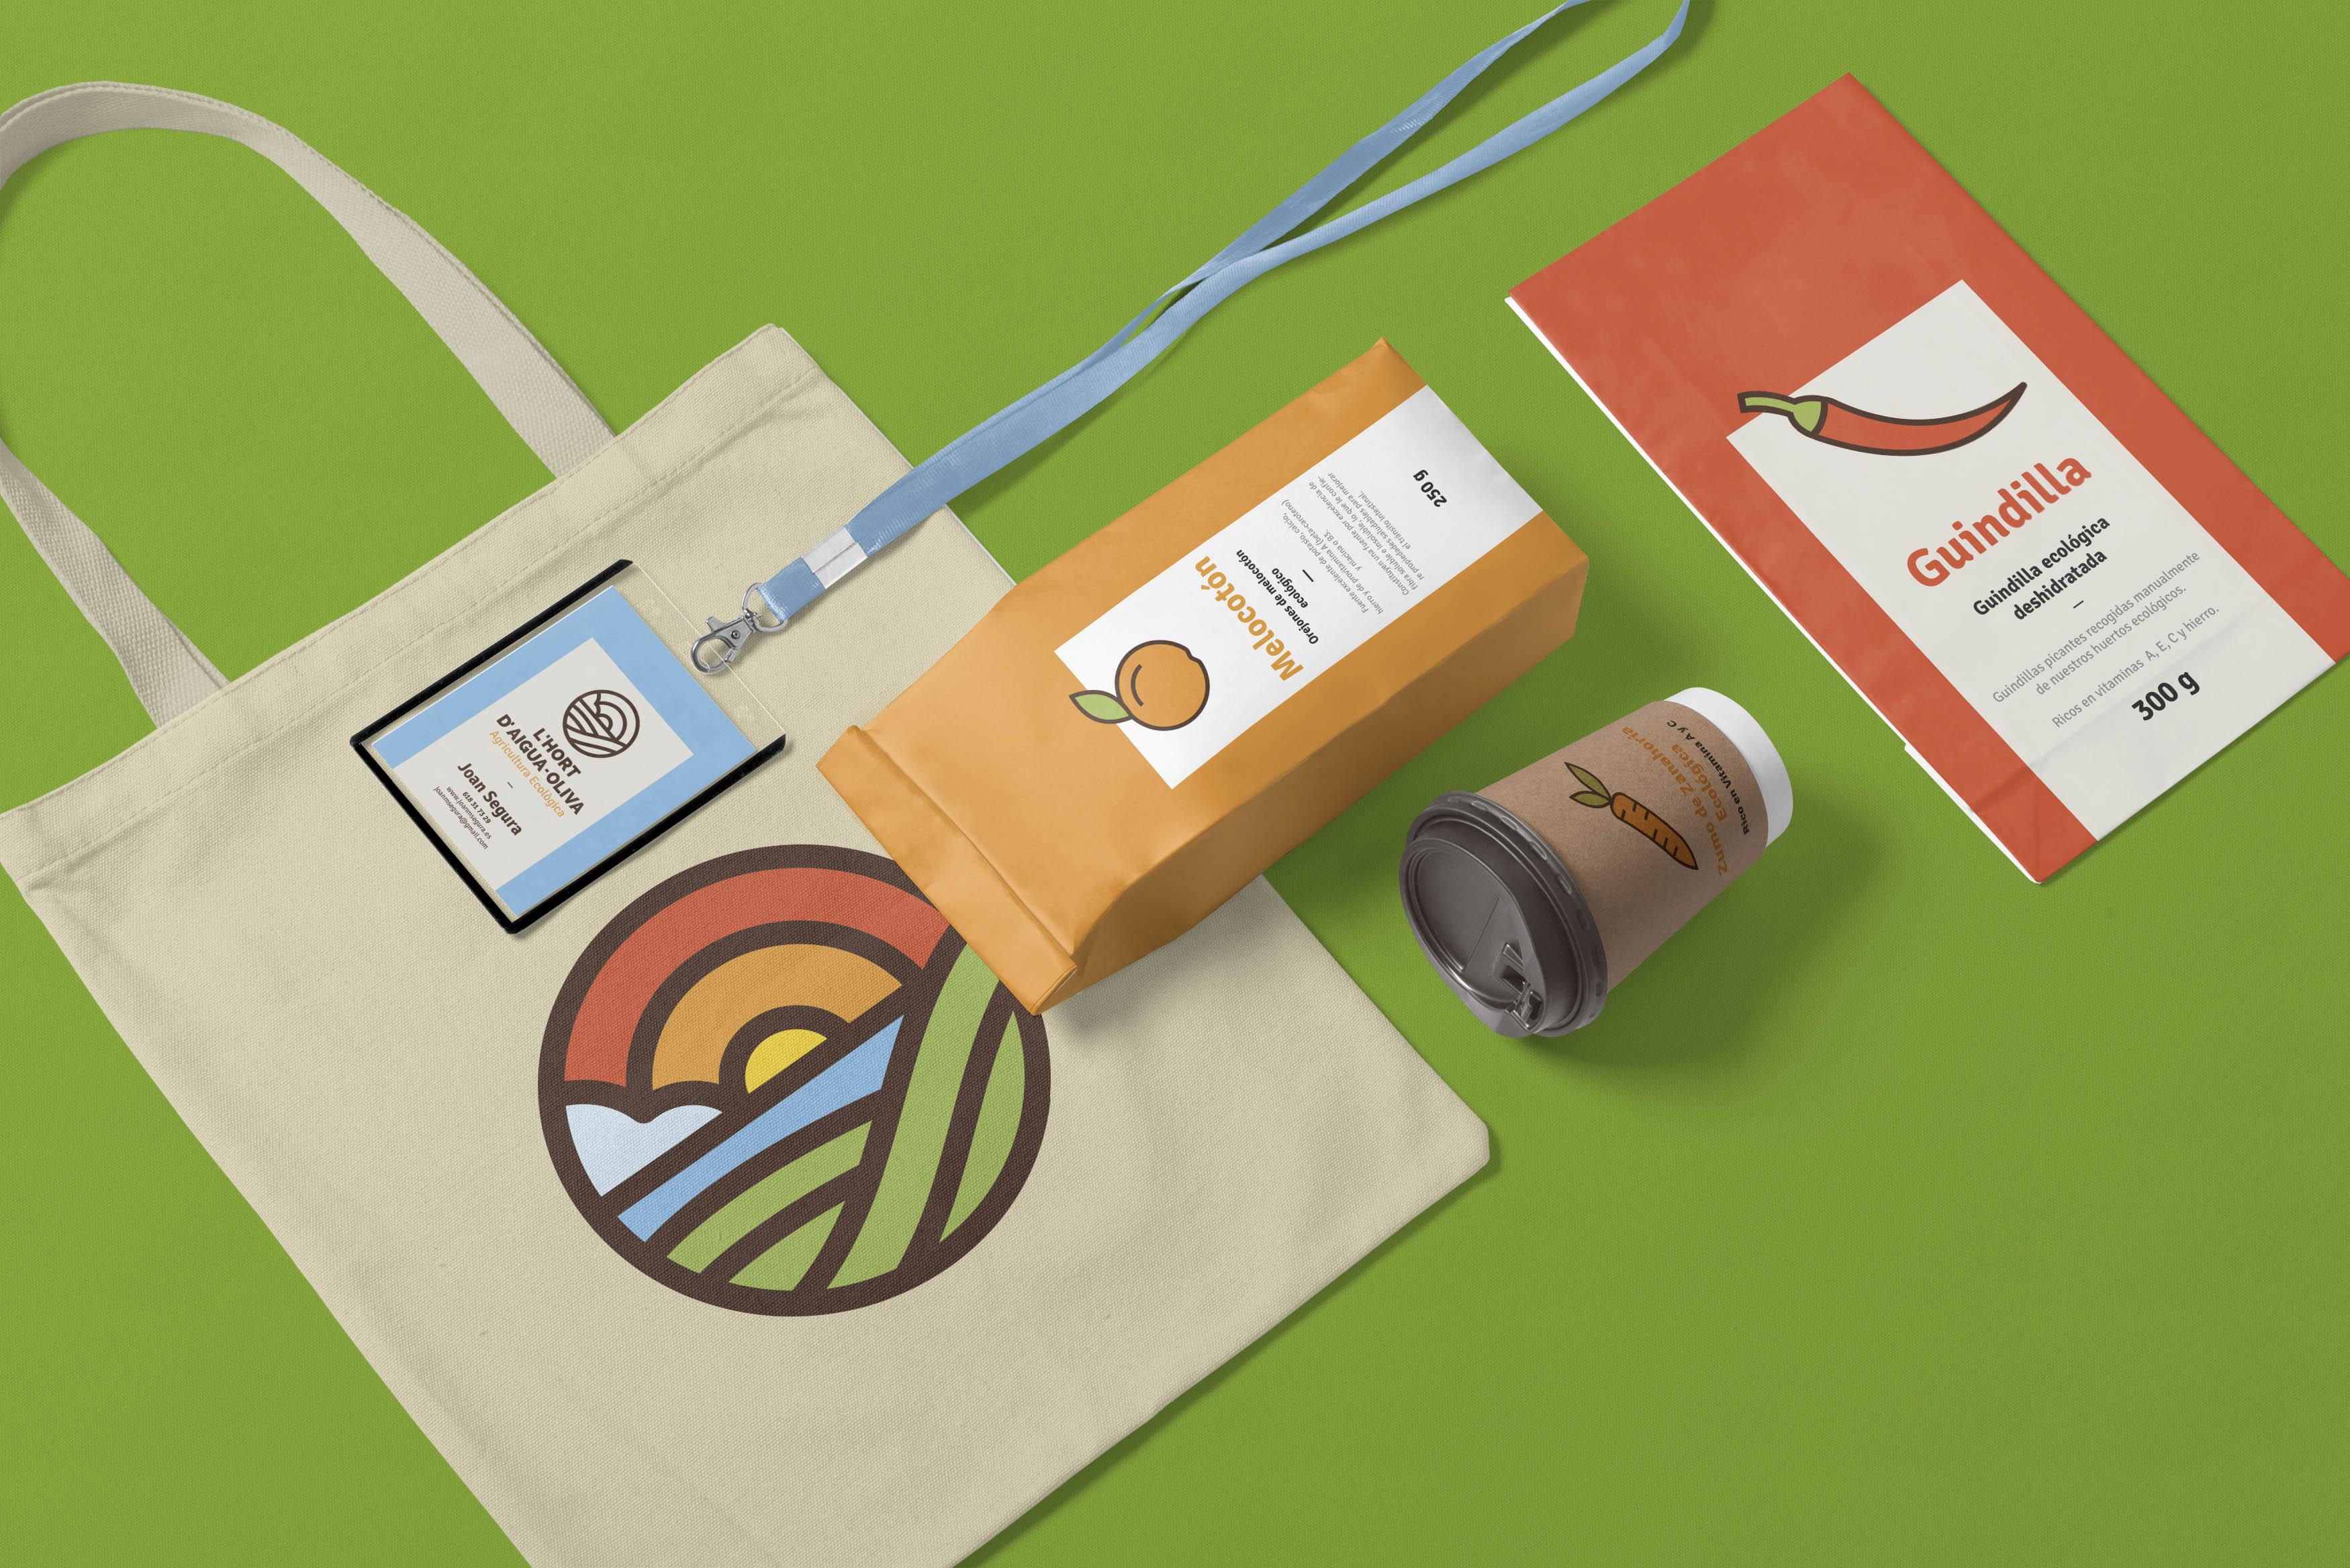 L'Hort d'Aigua-Oliva, diseño de logo, marca, identidad corporativa, logotipo, branding, packaging, etiquetas corporativas, agricultura ecológica